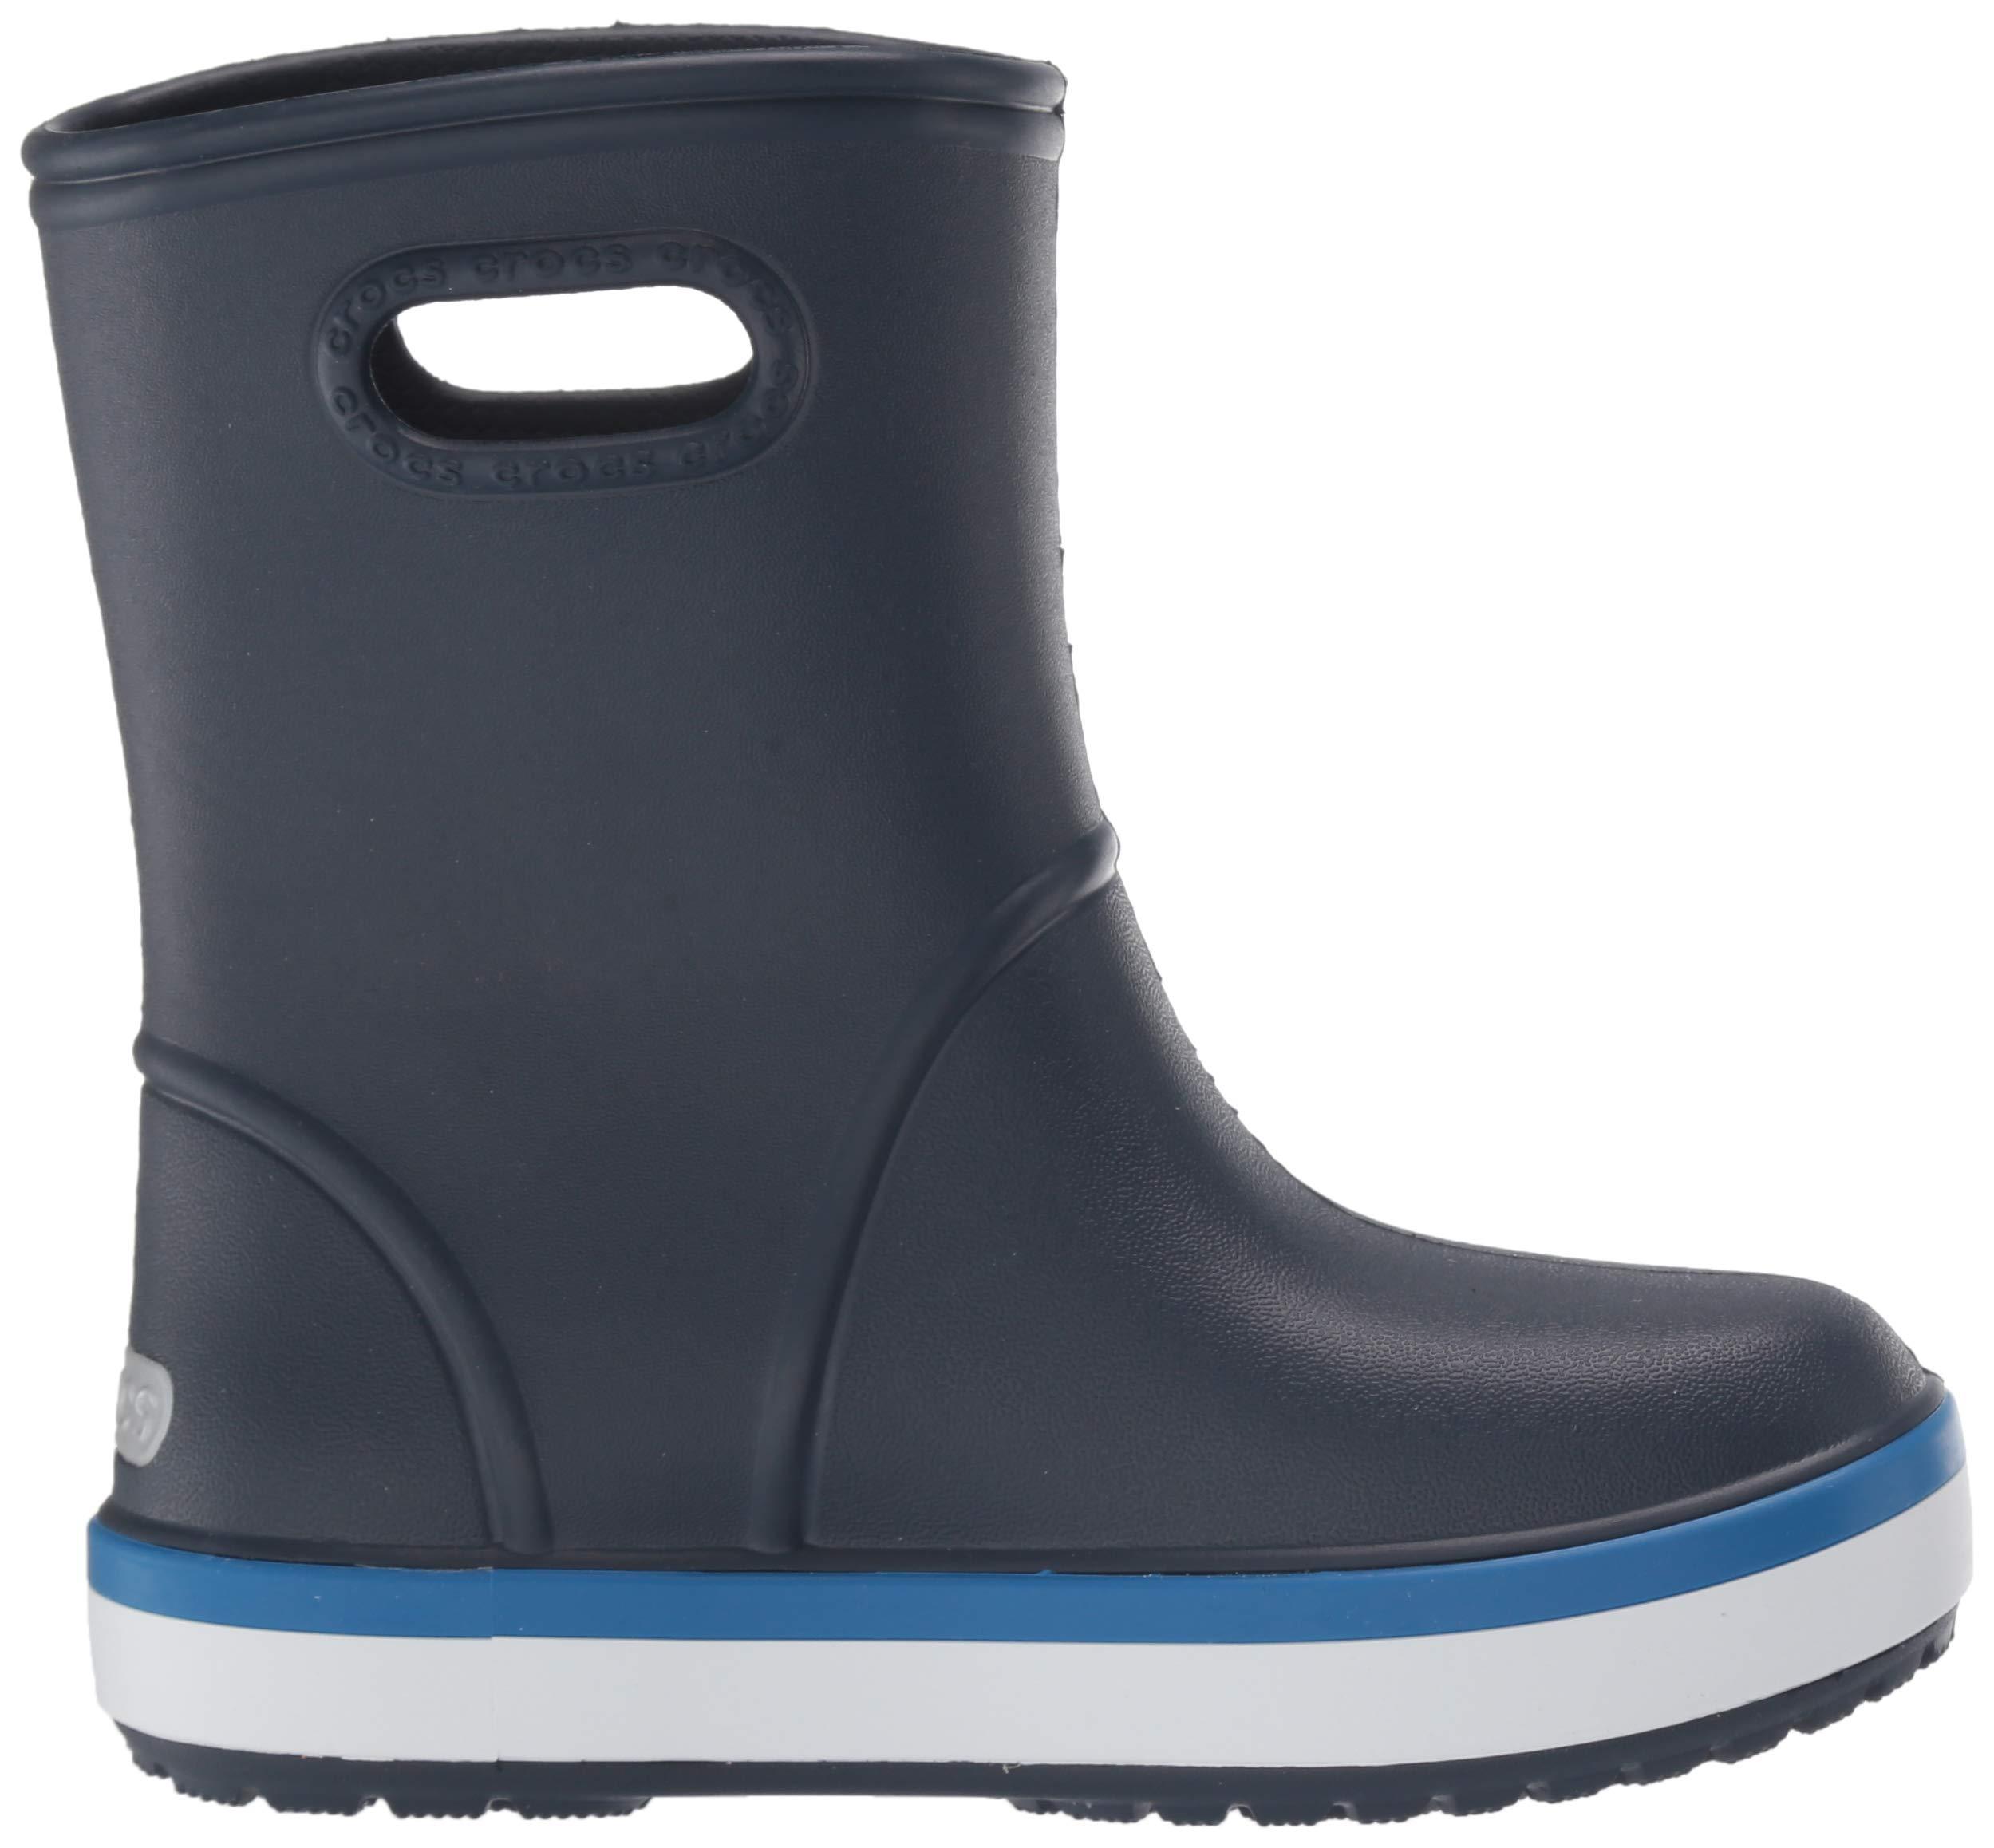 Crocs Unisex Crocband Rain Boot, Navy/Bright Cobalt, 2 M US Little Kid by Crocs (Image #7)